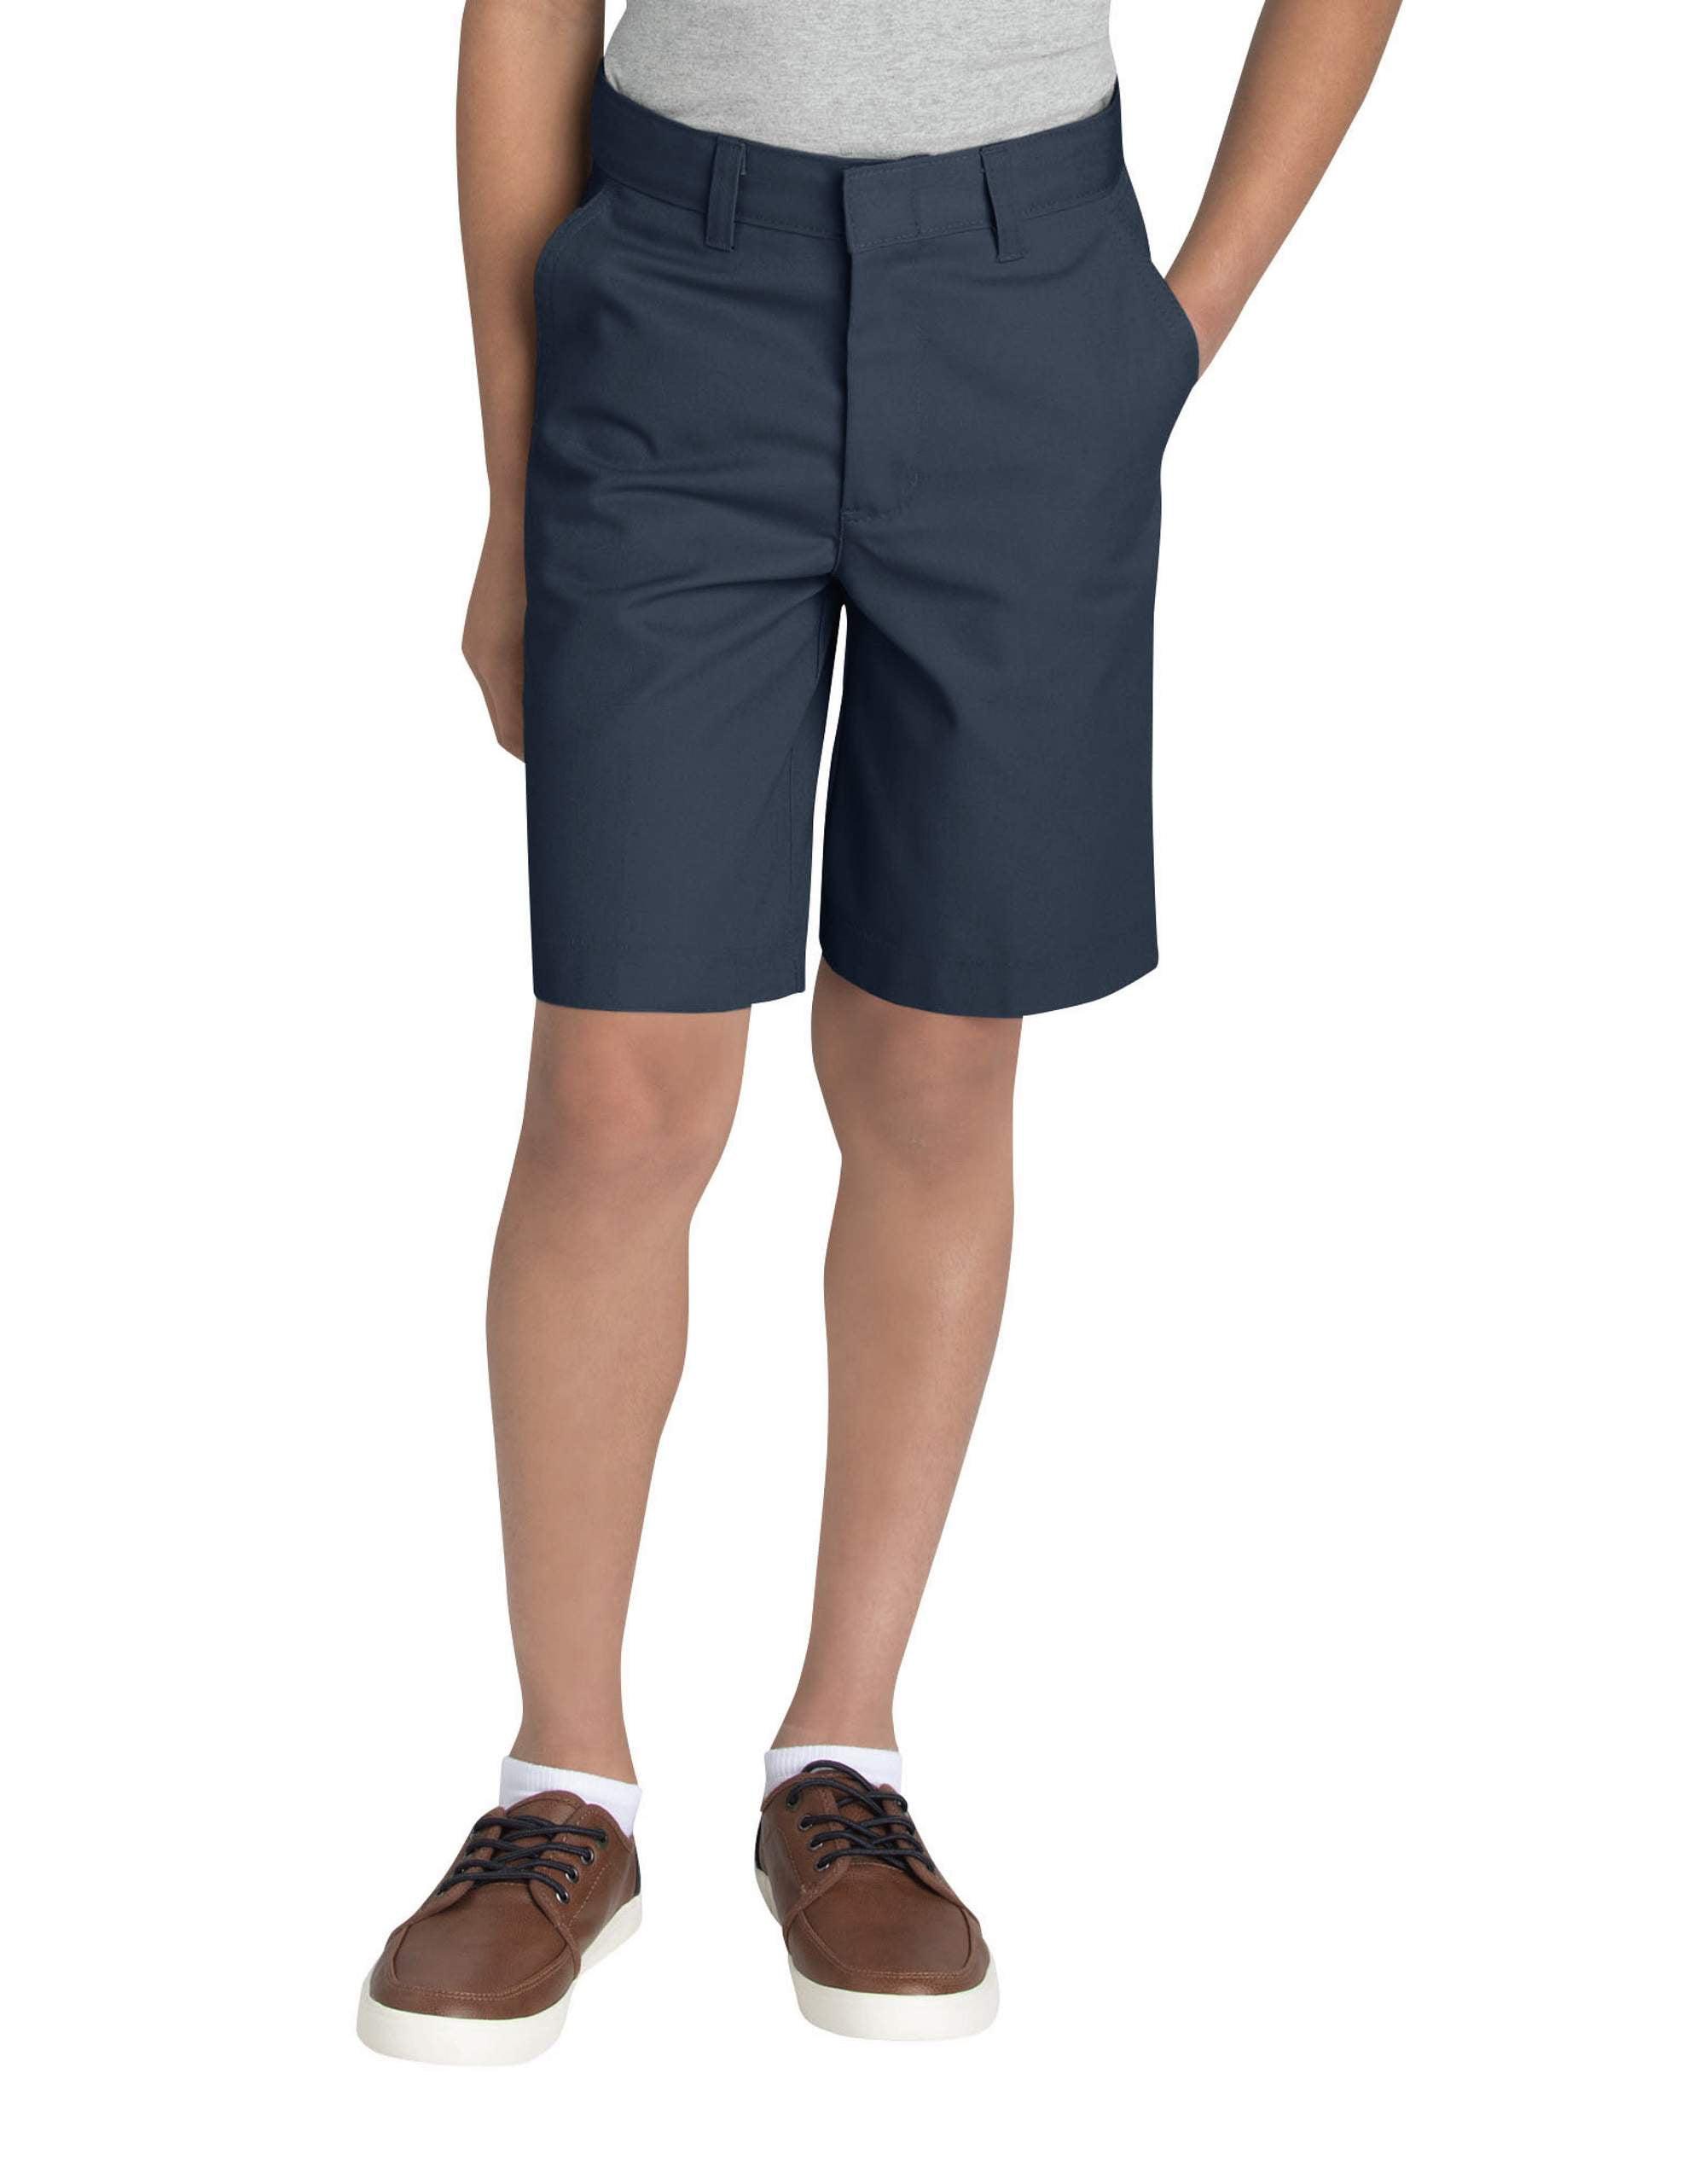 Boys' Uniform FlexWaist® Flat Front Short (Husky)